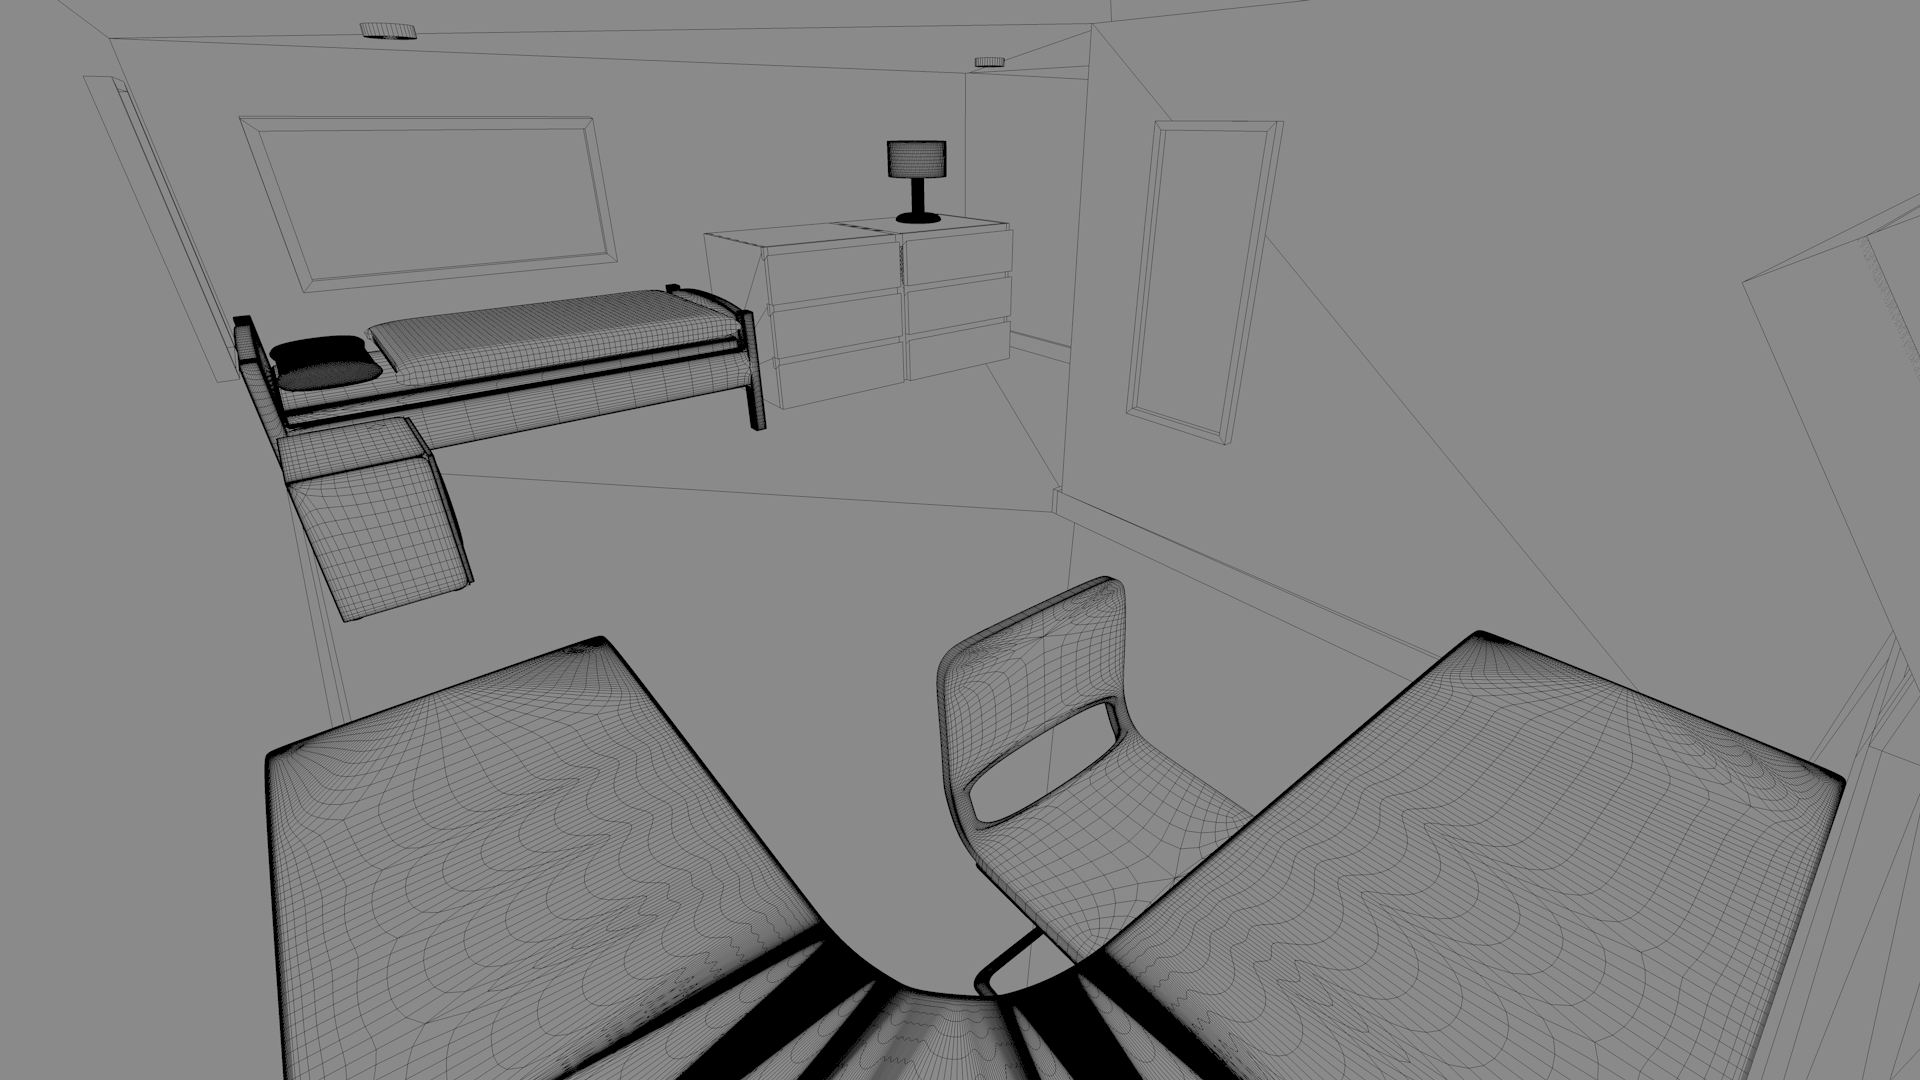 Room design 3d model obj 3ds c4d dae for Unity 3d room design